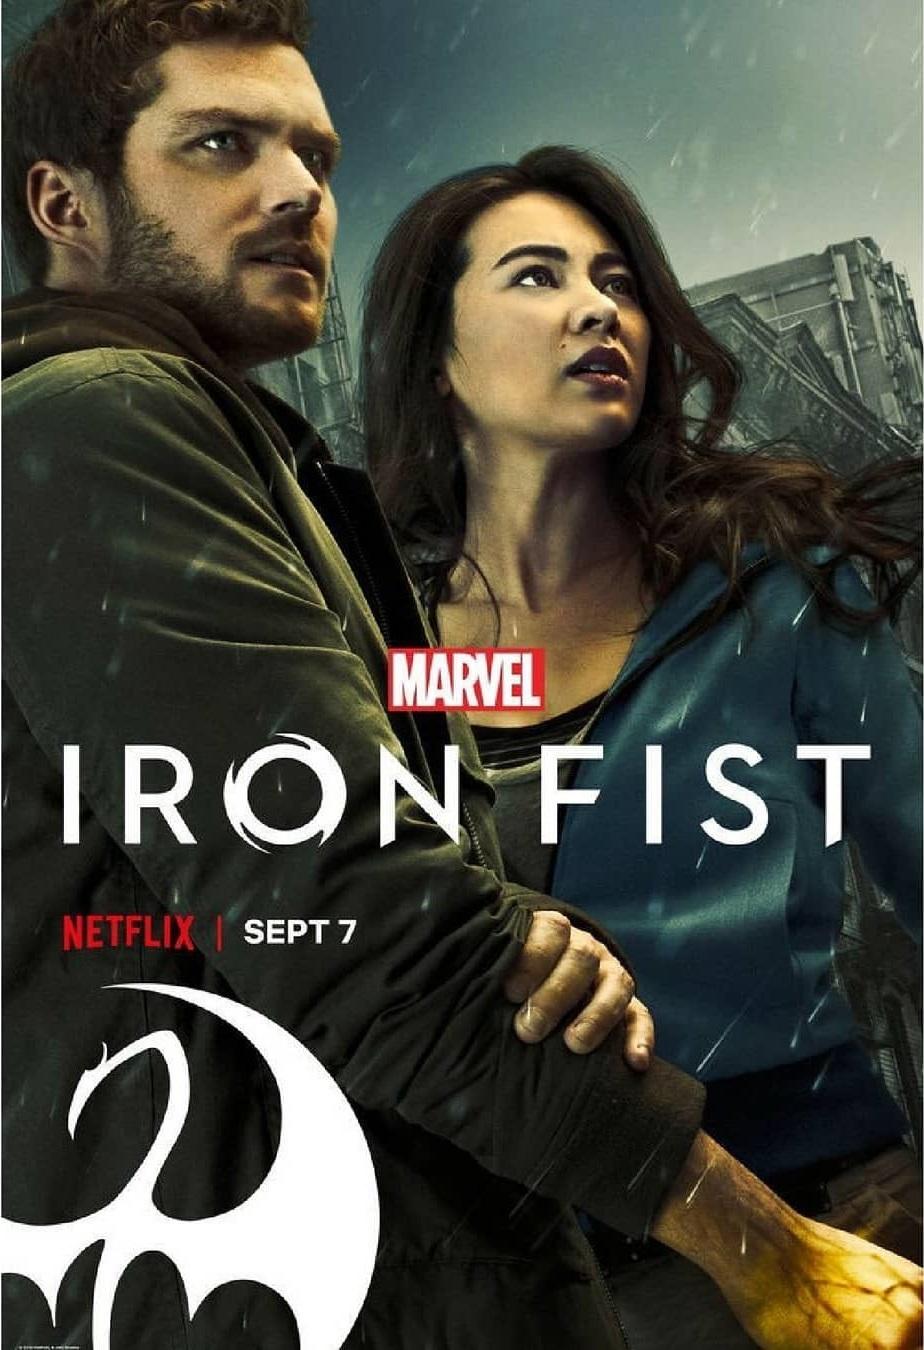 Marvel's Iron Fist T2 Complt Dual WEB-DL x264 1080 Ligero GD